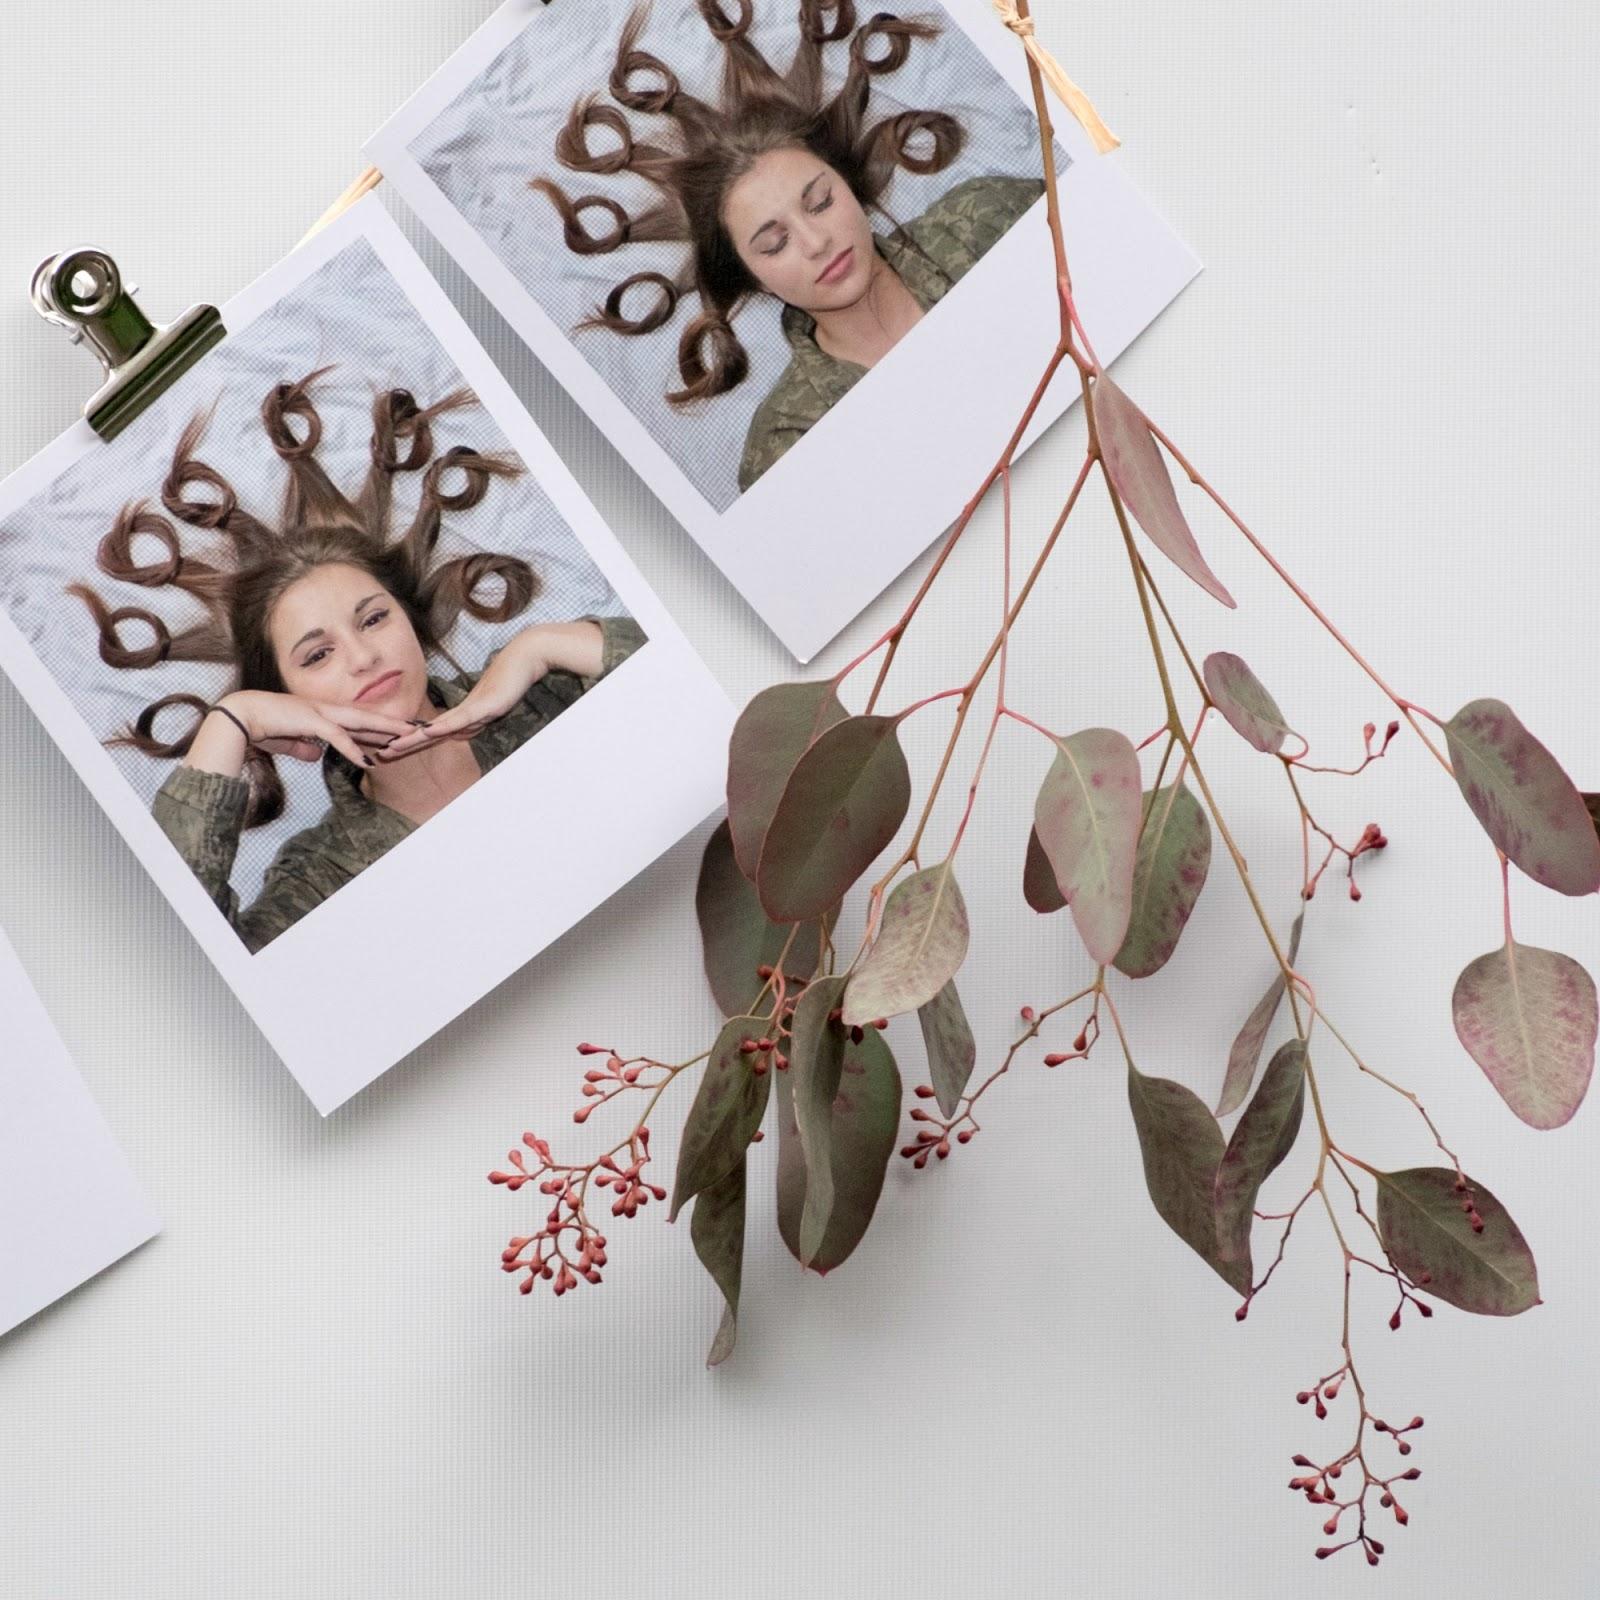 retroprints met Polaroid frame